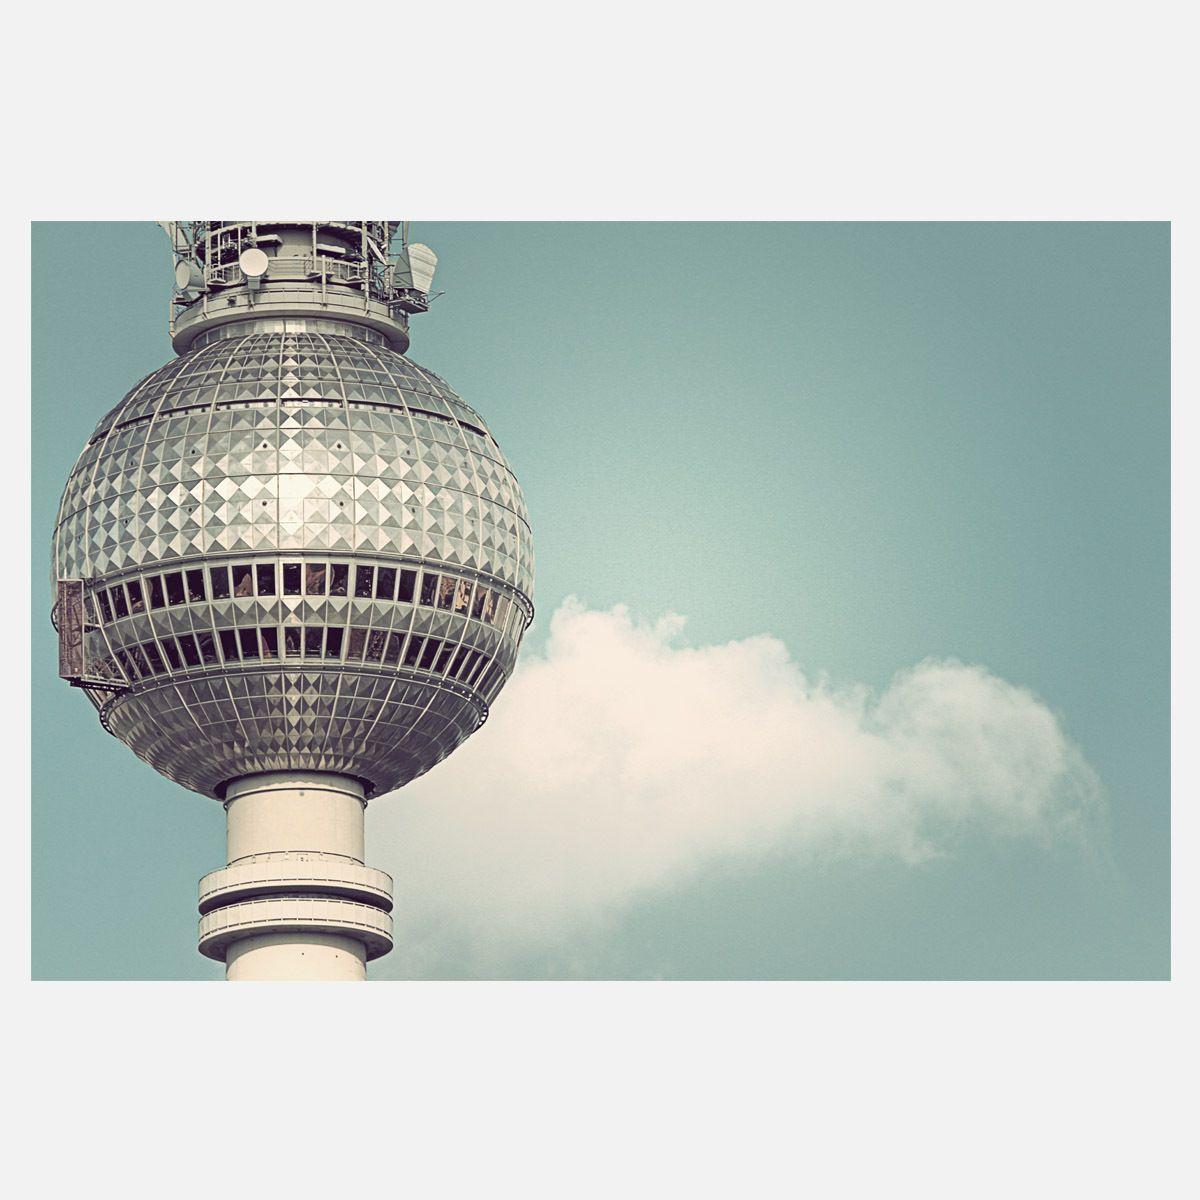 Berlin. Fernsehturm. Love.